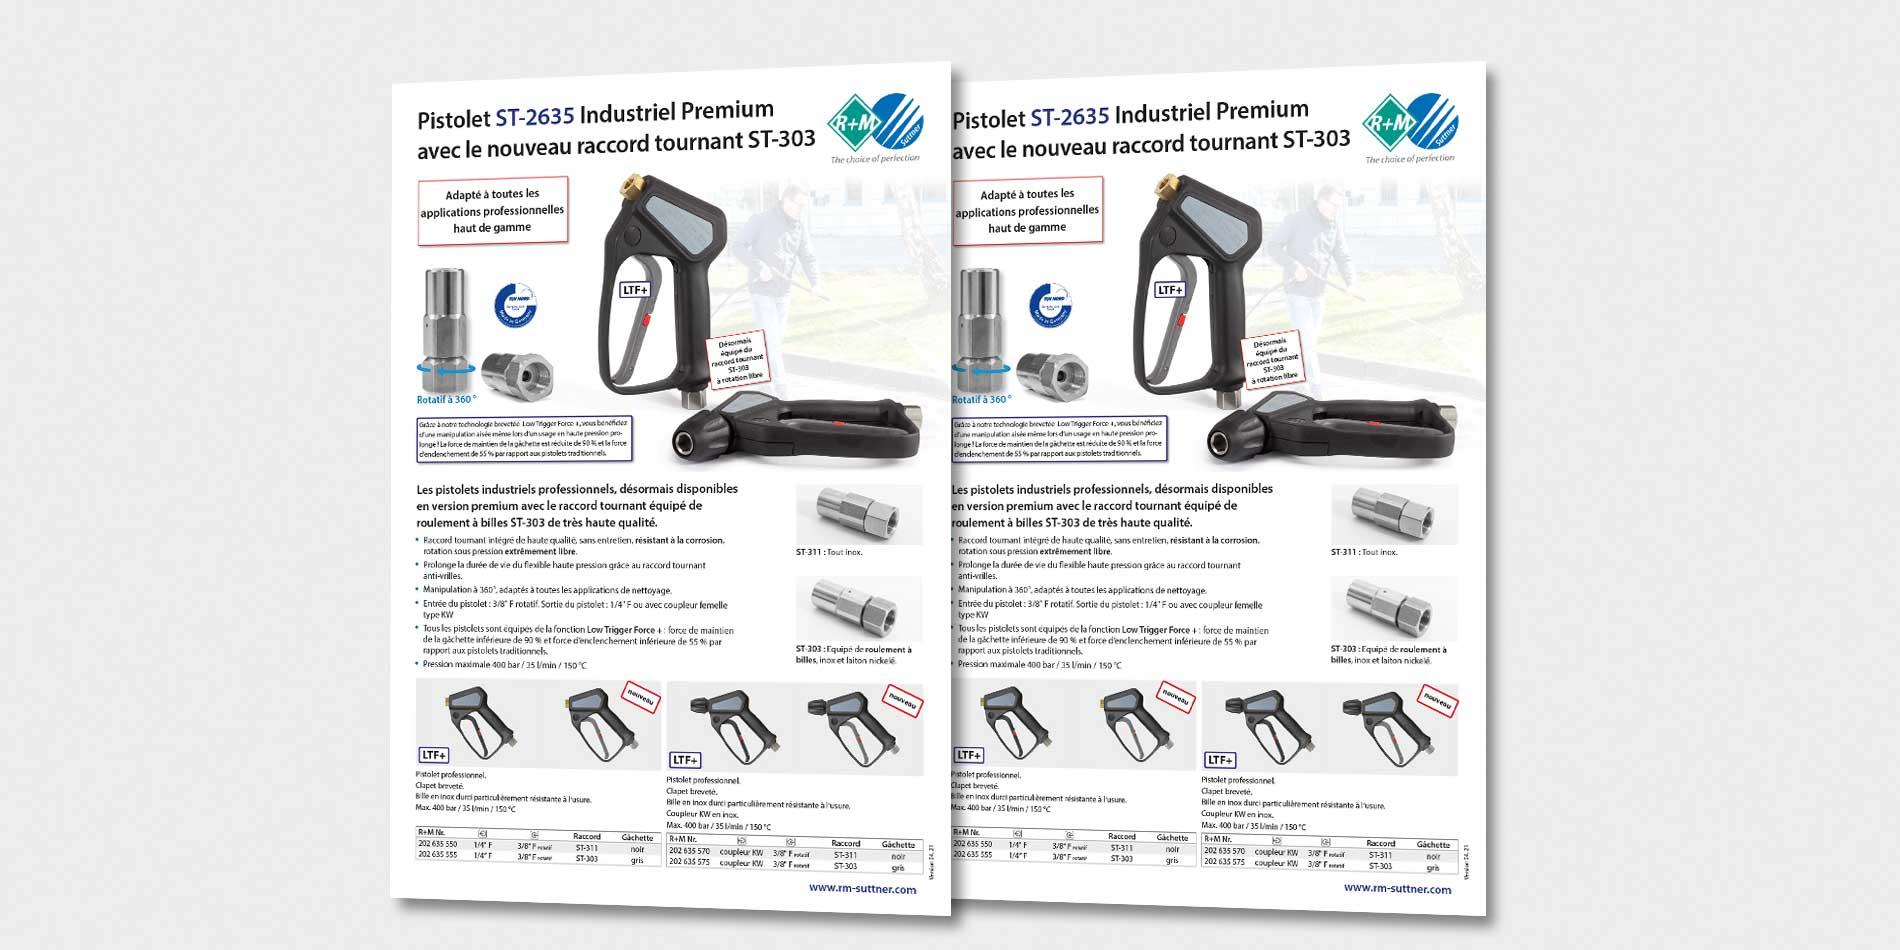 Pistolet ST-2635 Industriel Premium